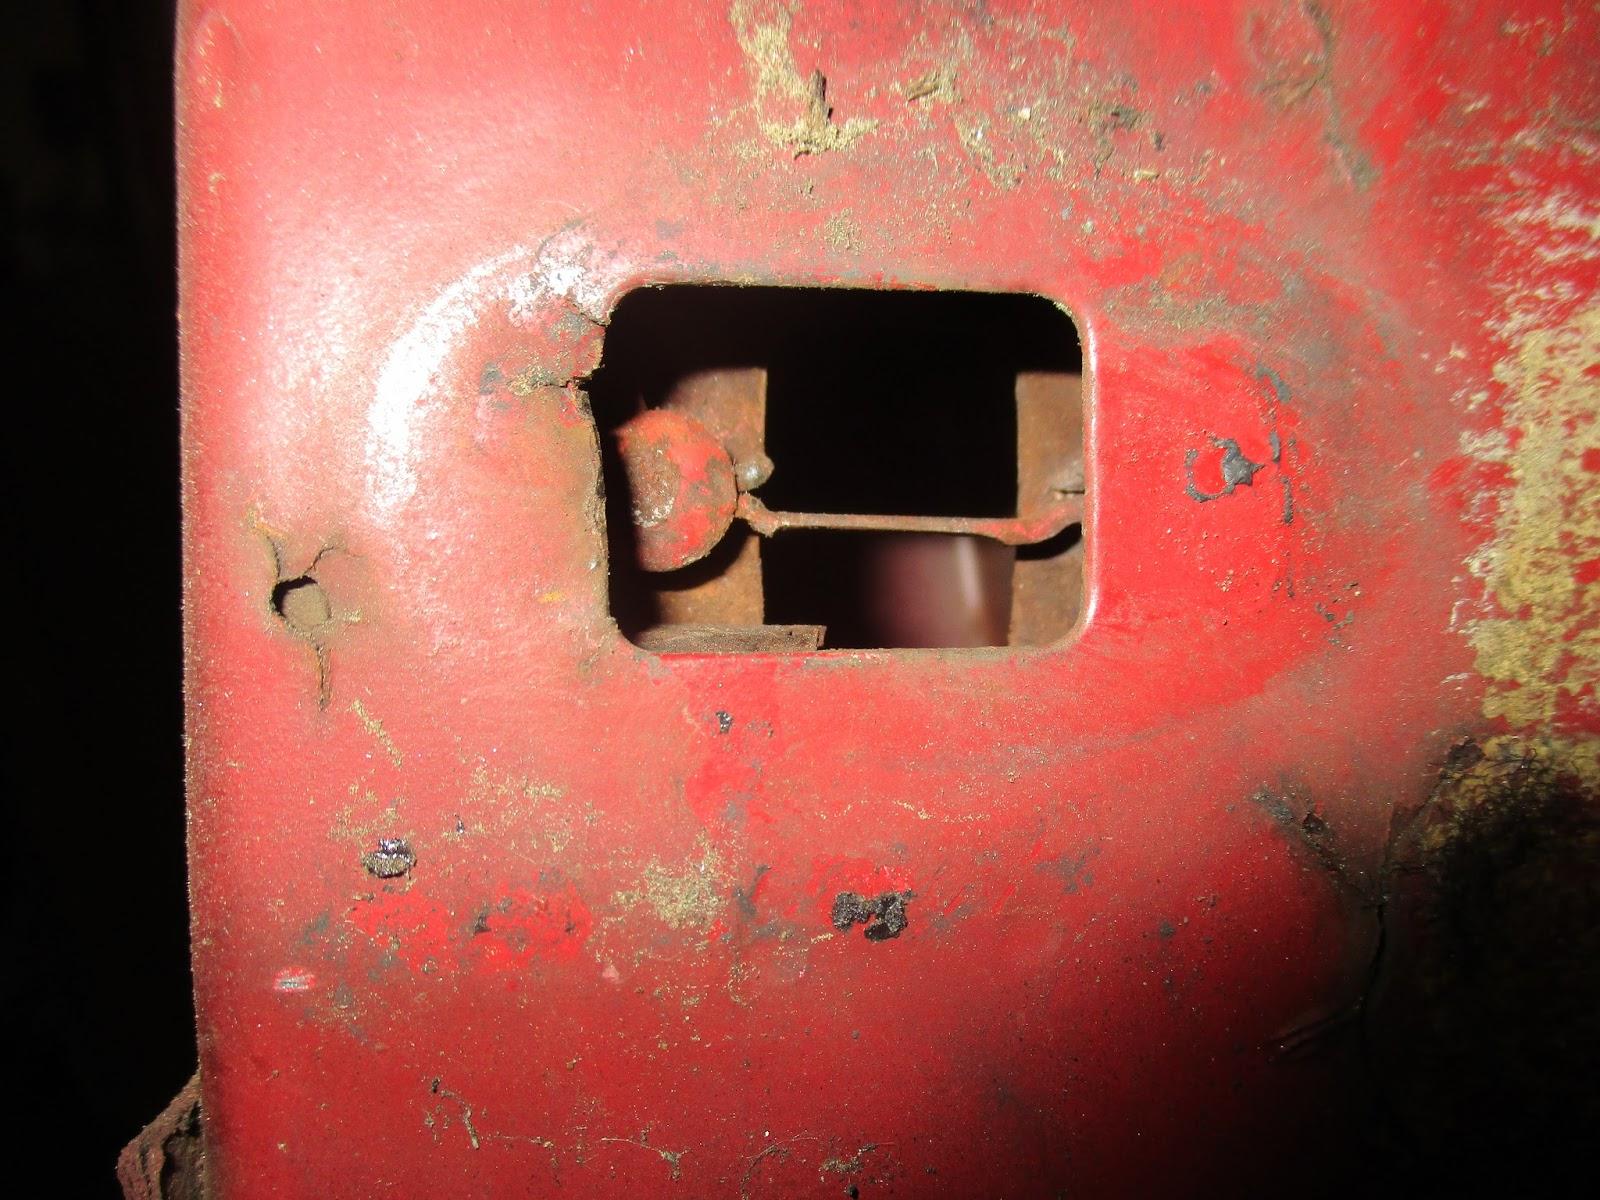 Roundtail Restoration Triumph Spitfire Body Removal Preparation 5